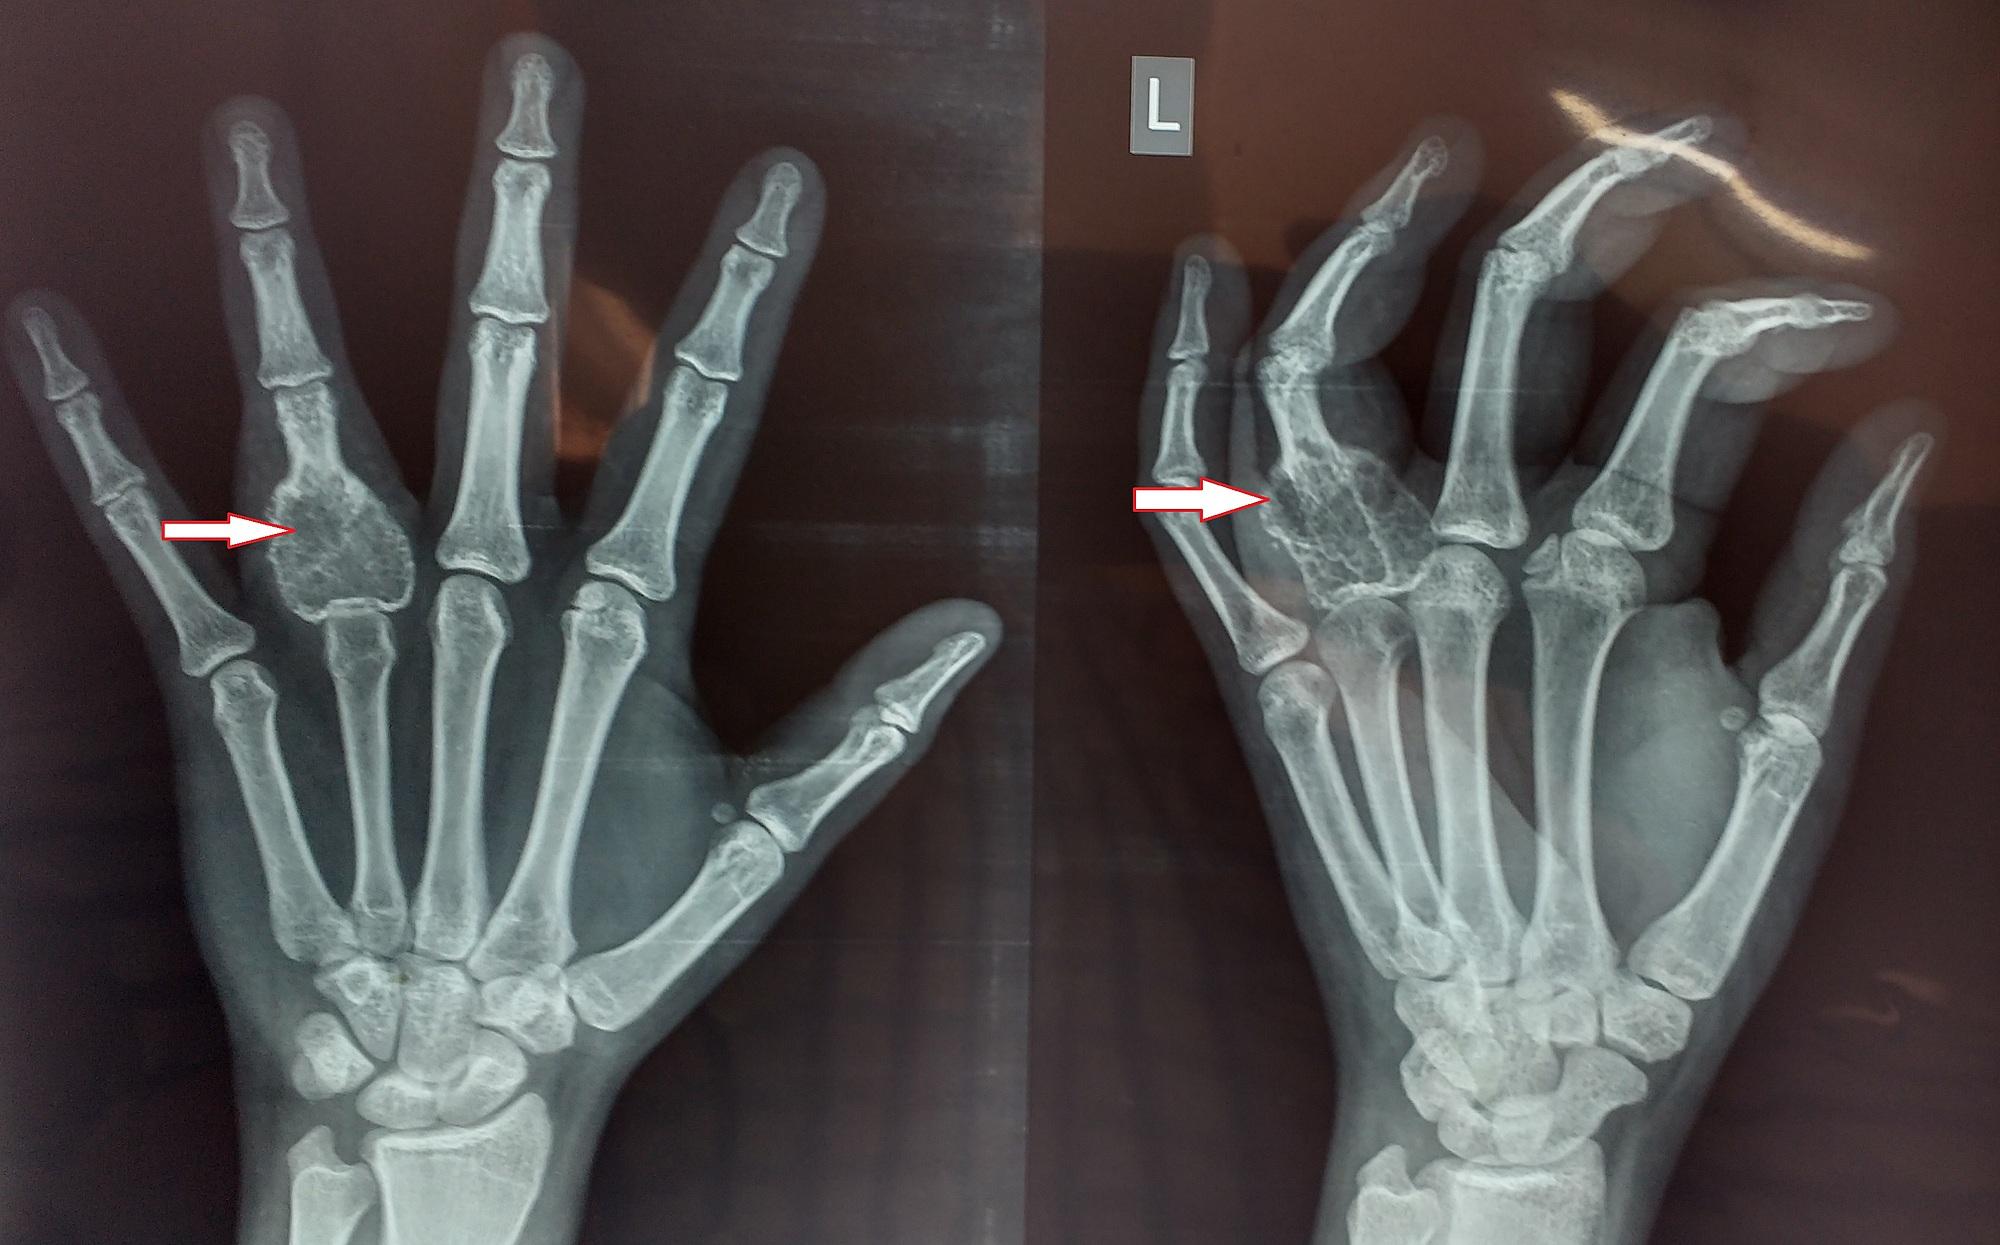 Cureus | Giant Cell Tumour of Proximal Phalanx of Ring Finger: Case ...